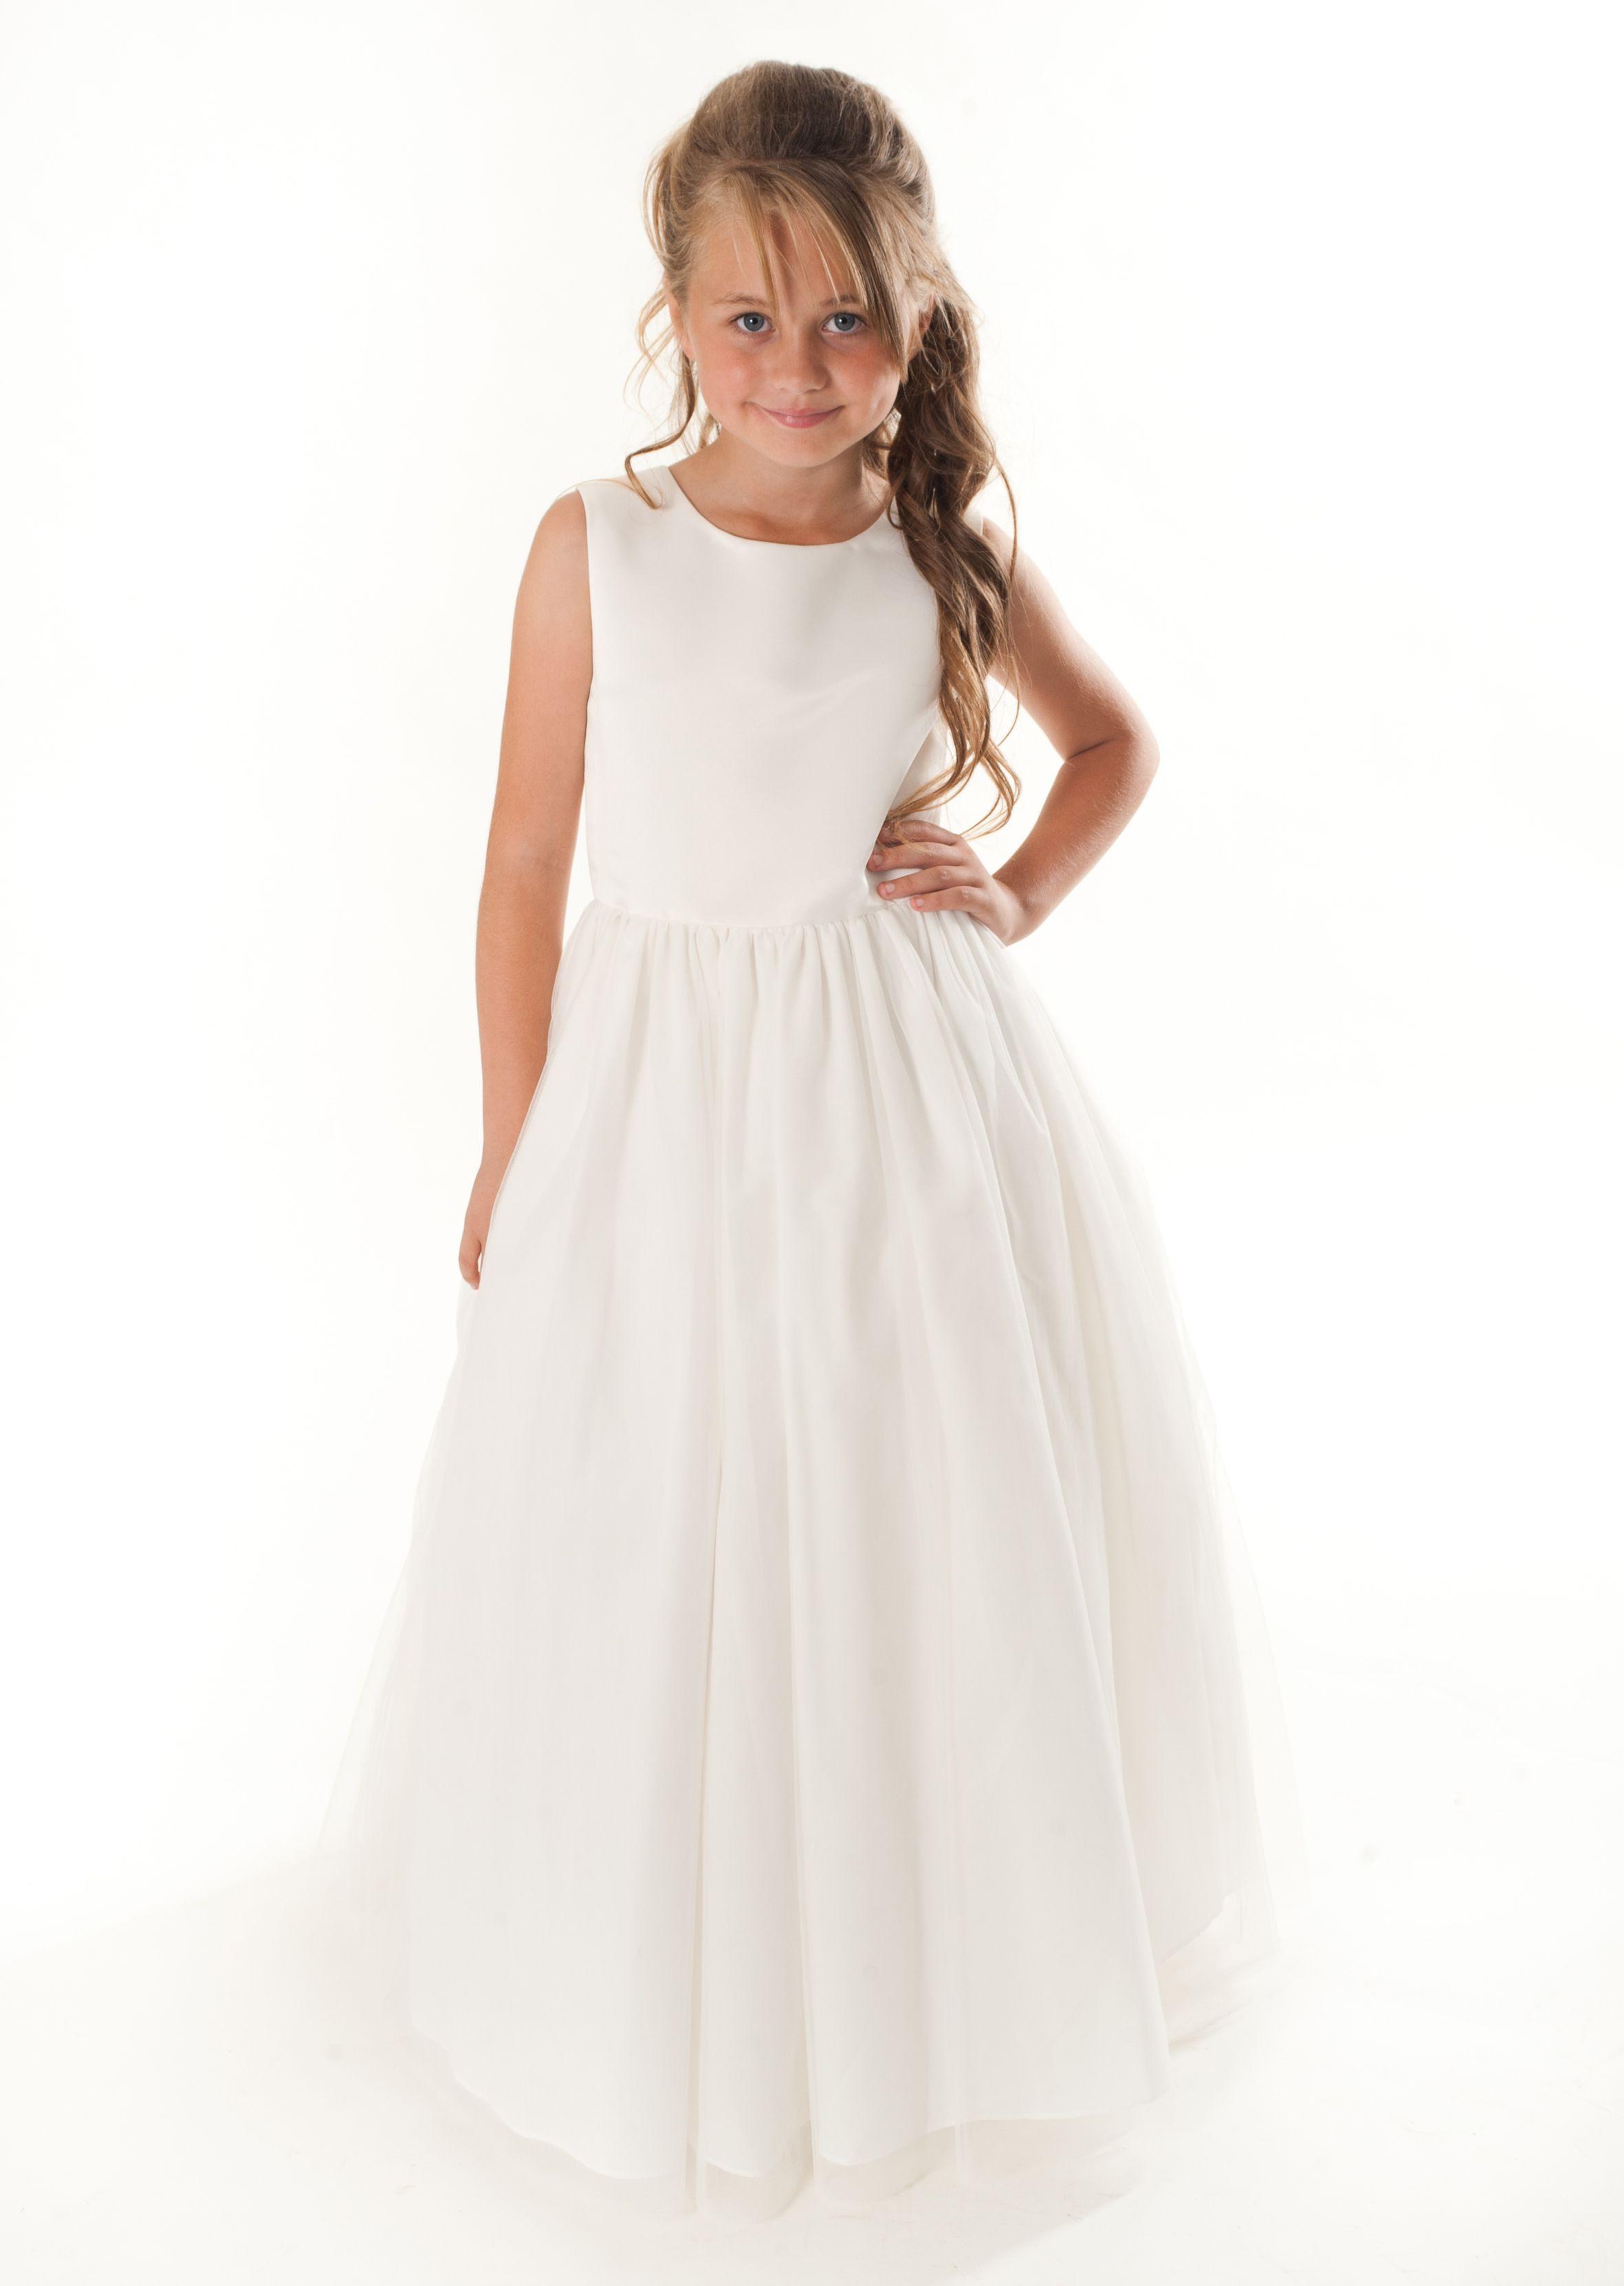 Linzi Jay Fl600 Plain Satin Tulle Flowergirl Dress Spring